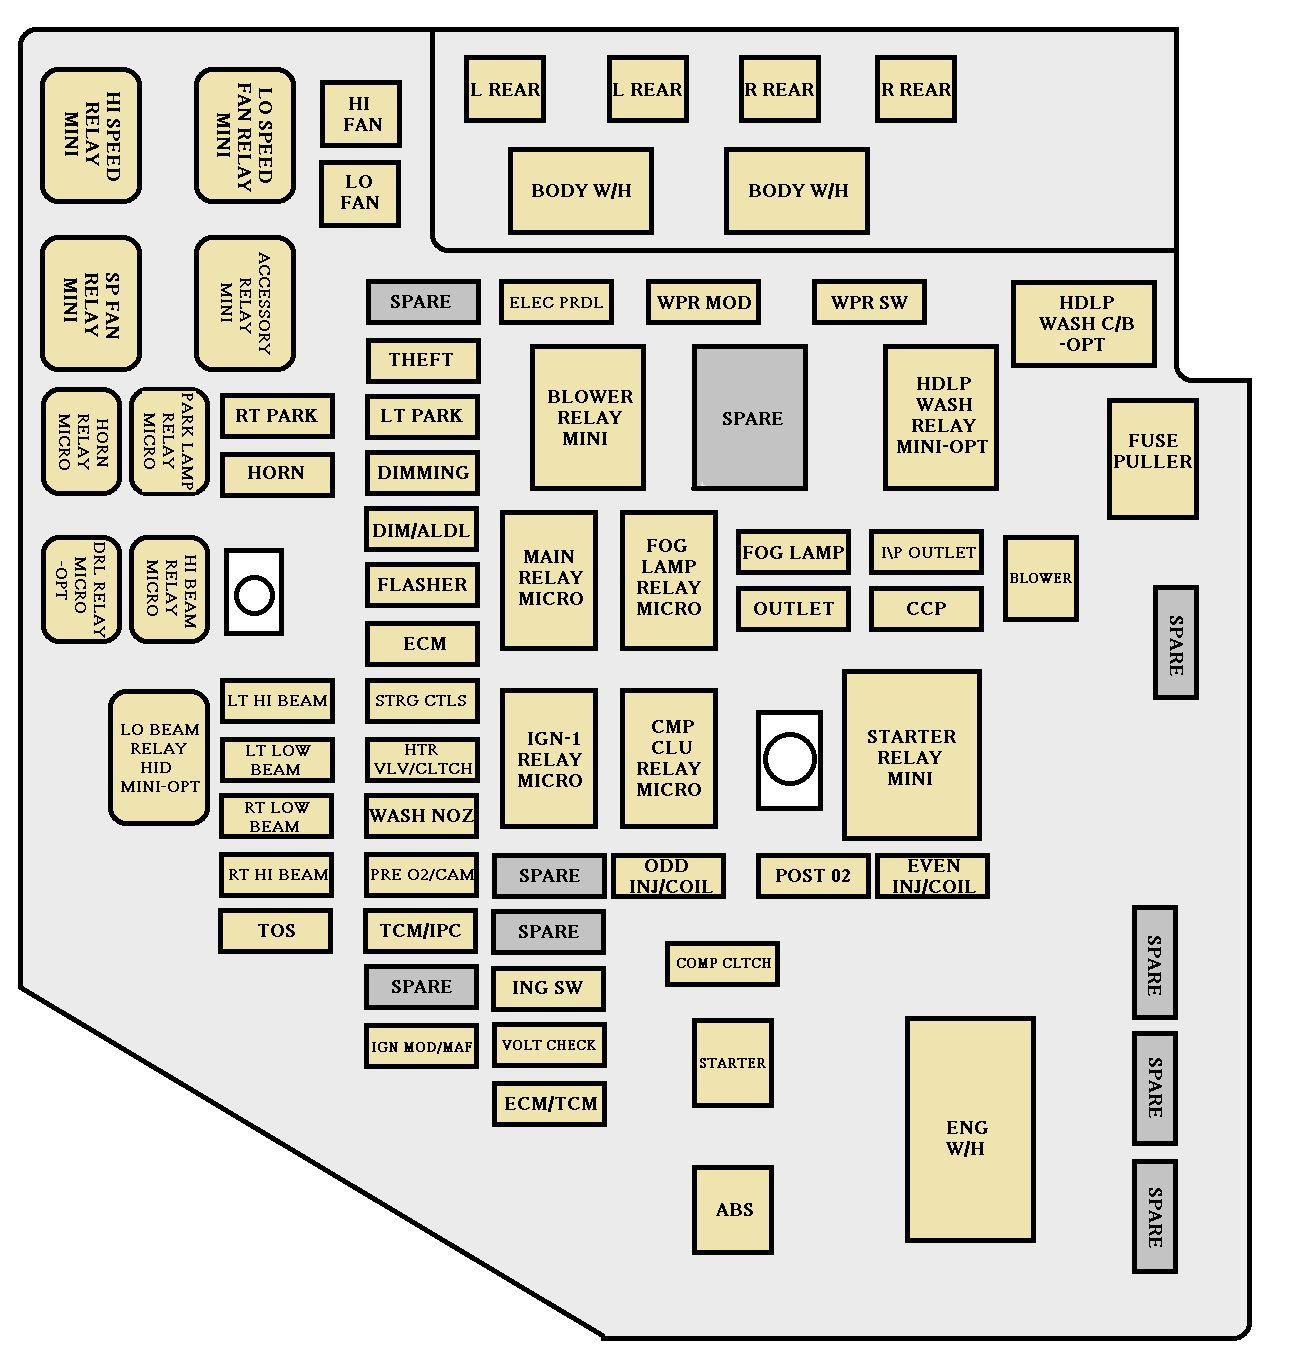 2008 cadillac fuse diagram wiring diagram experts2008 cadillac fuse box wiring diagram 2008 cadillac cts fuse diagram 2008 cadillac fuse diagram